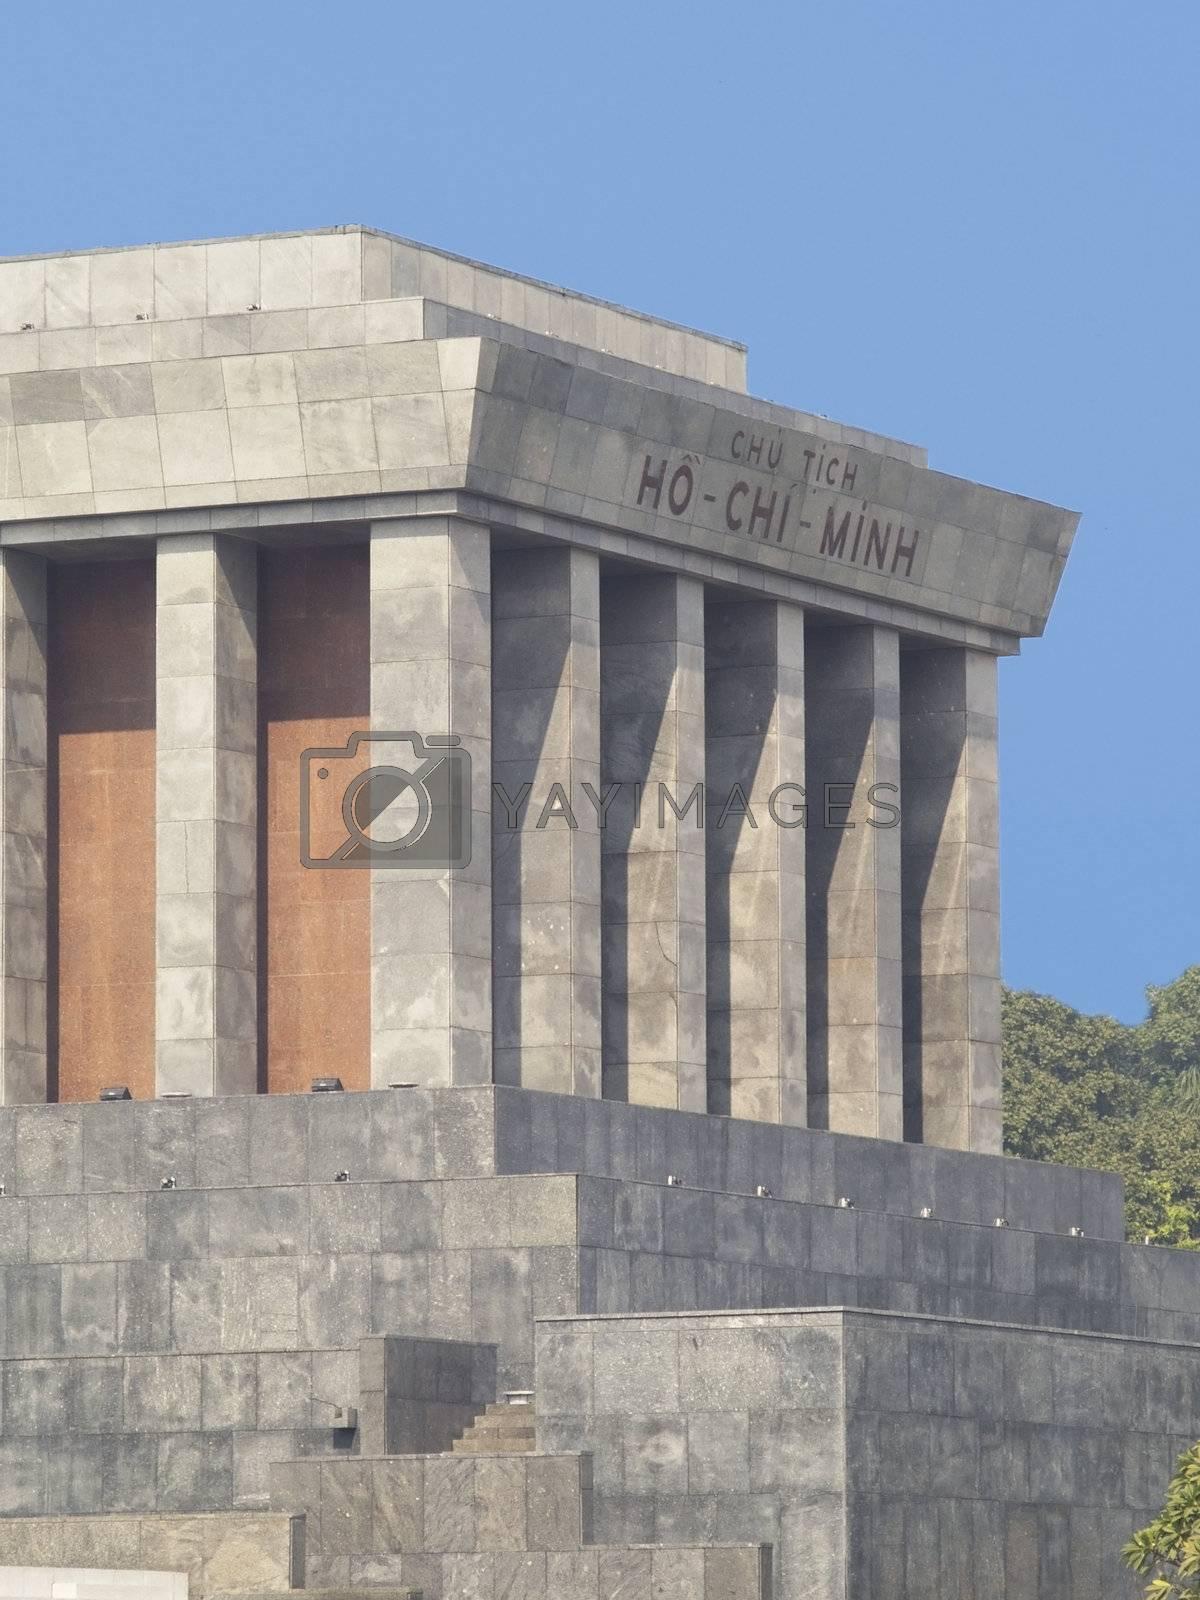 The Ho Chi Minh Mausoleum by epixx